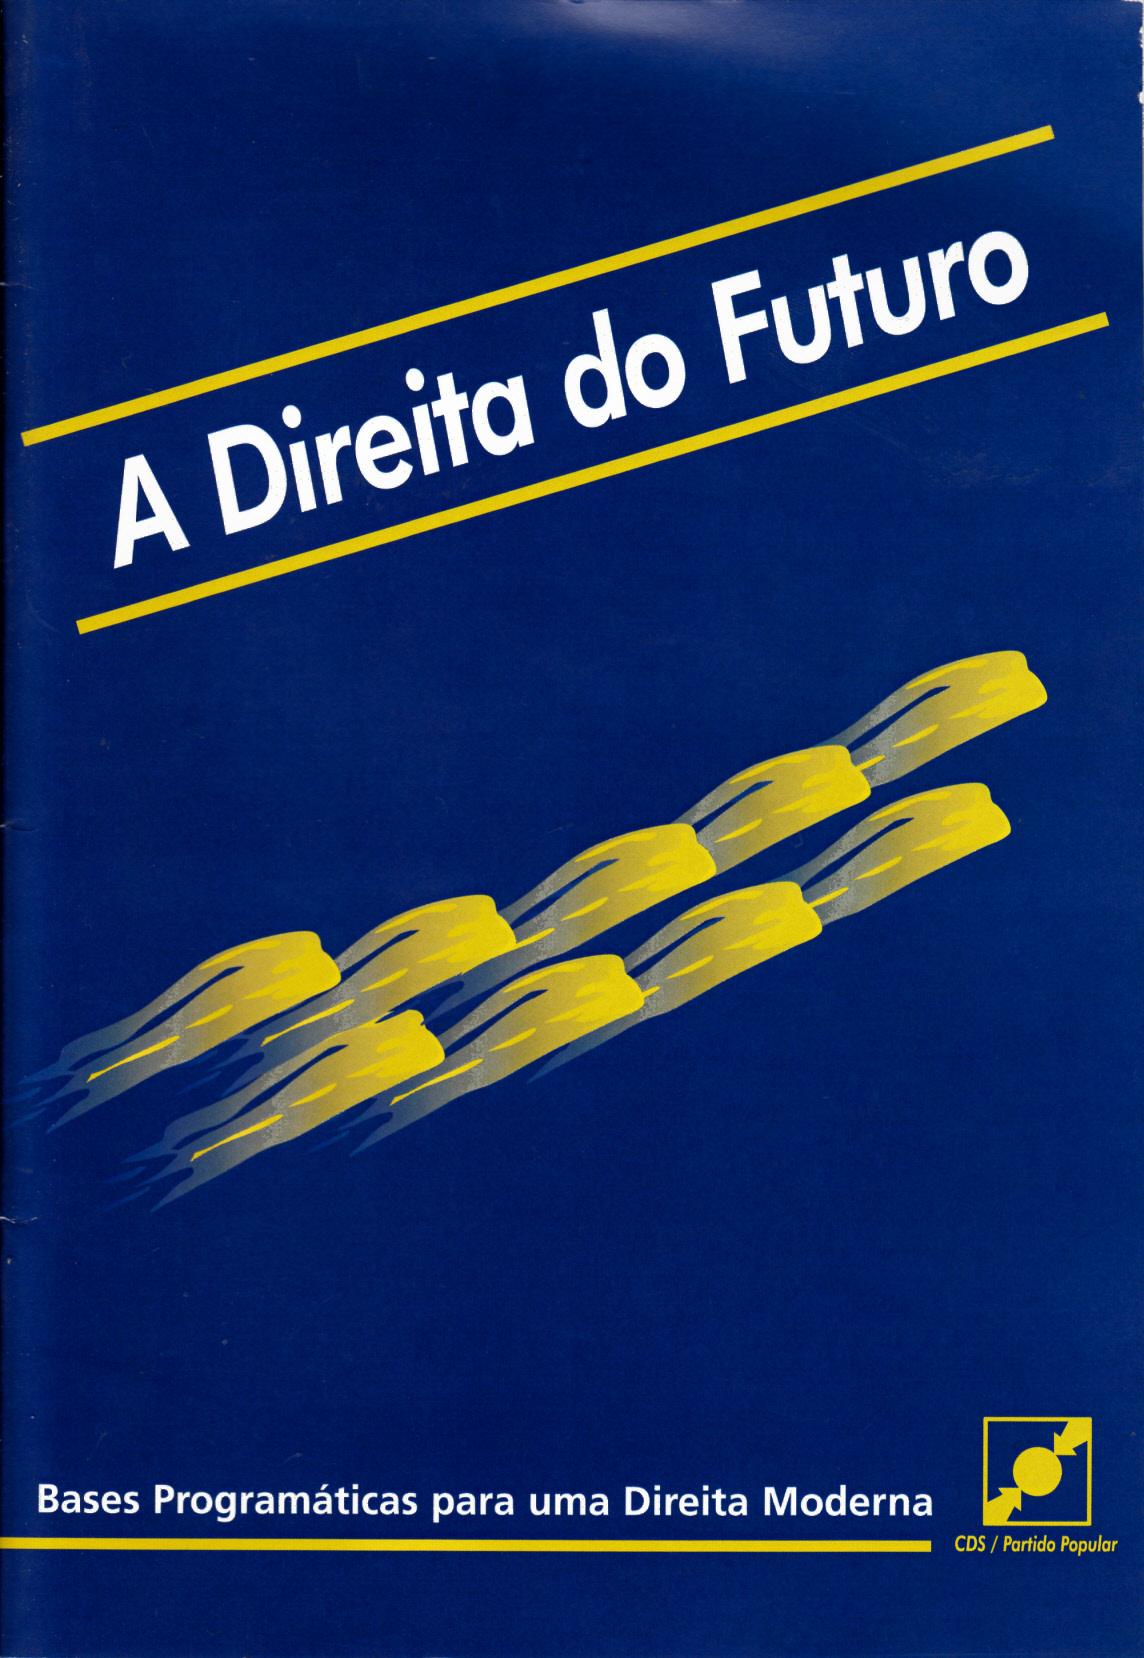 CDS_20_congresso_mocao